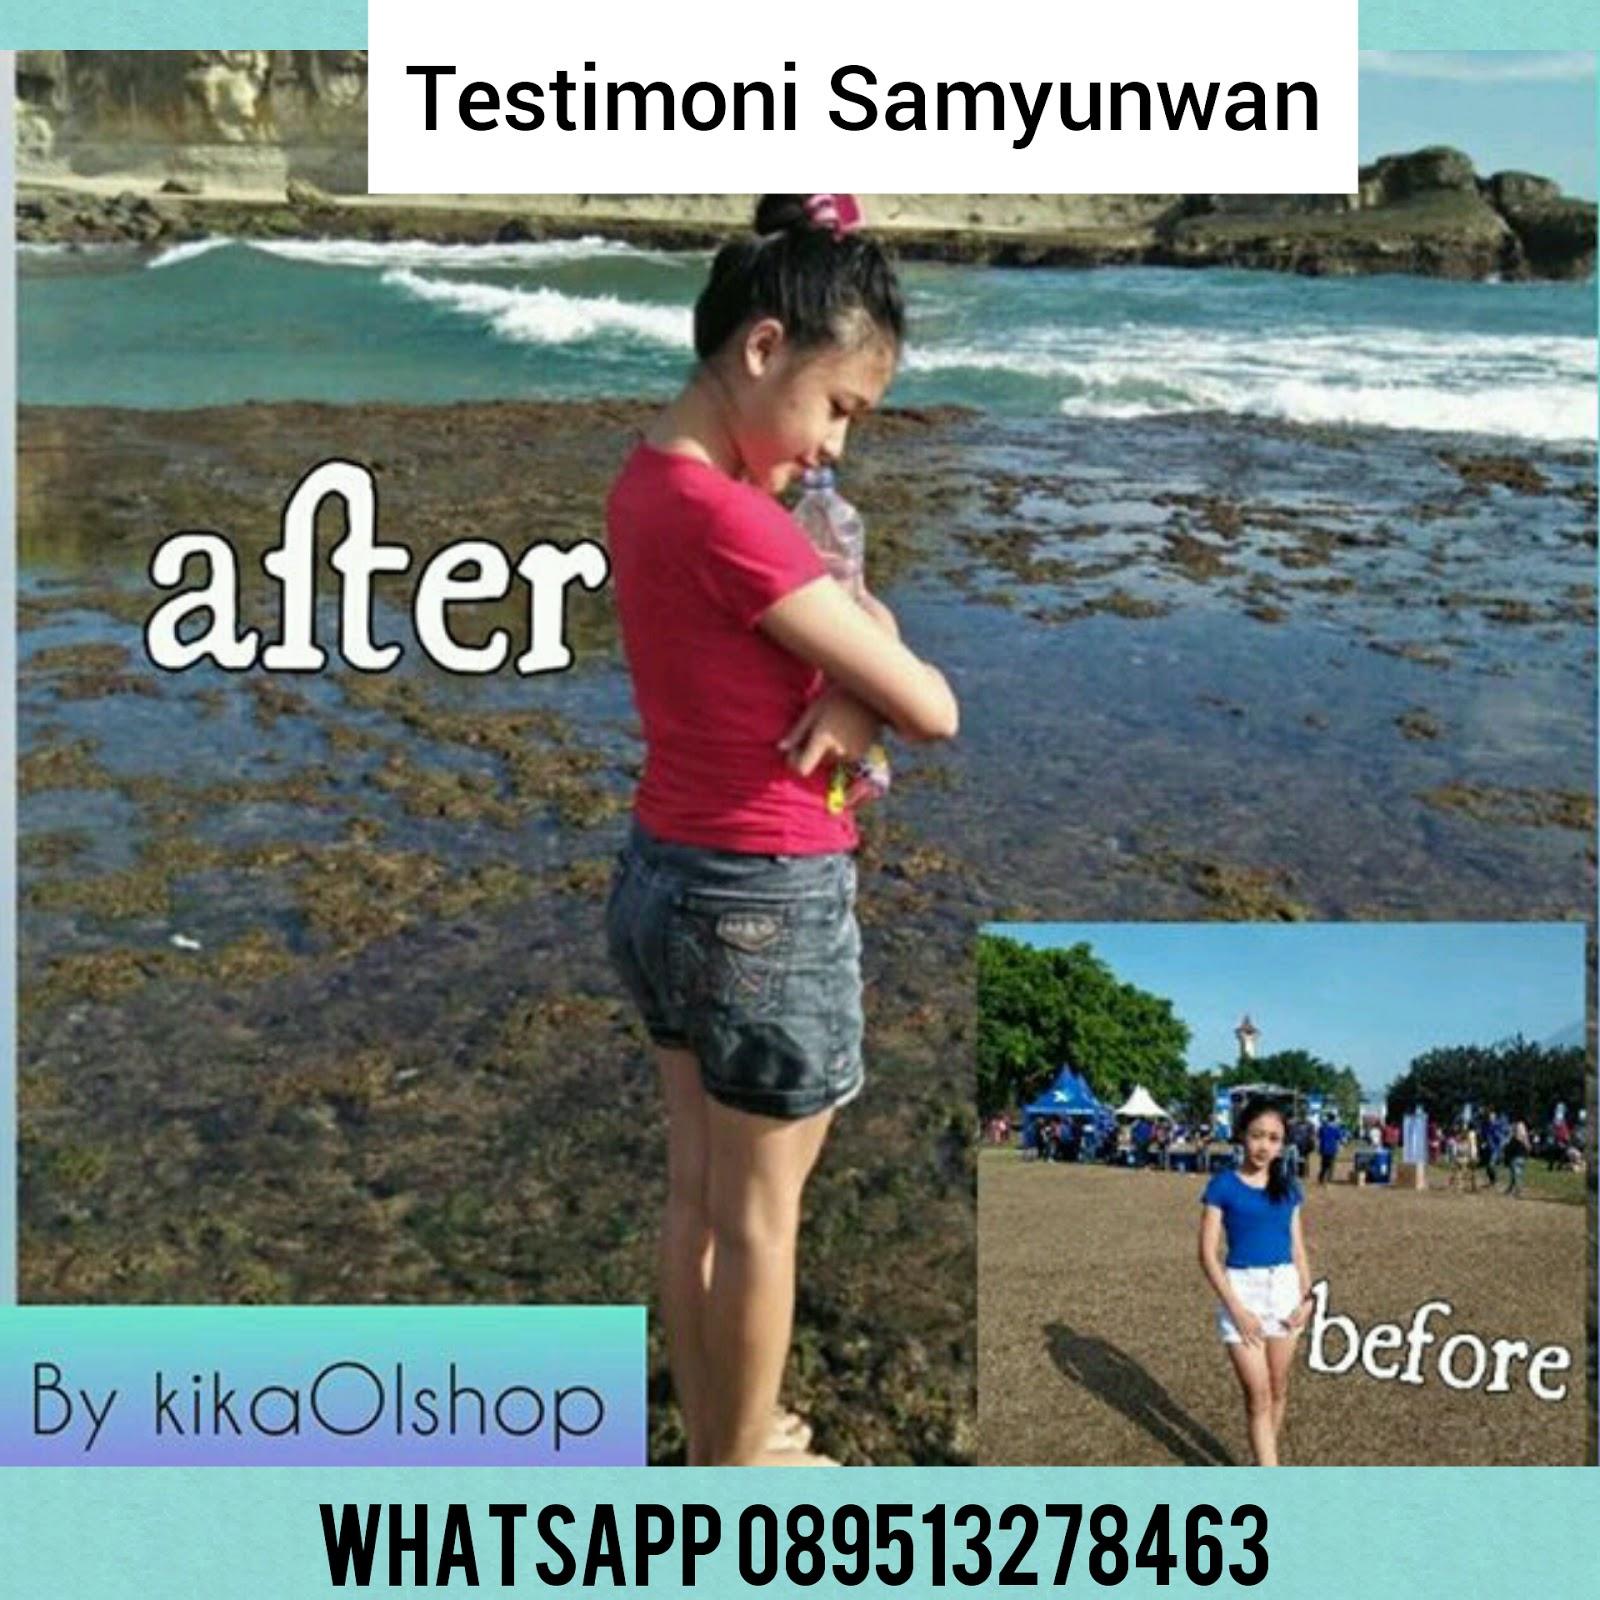 Samyunwan Penggemuk Badan Sam Yun Wan Samyun Wisdom Original Obat Penambah Nafsu Makan Hati Palsu